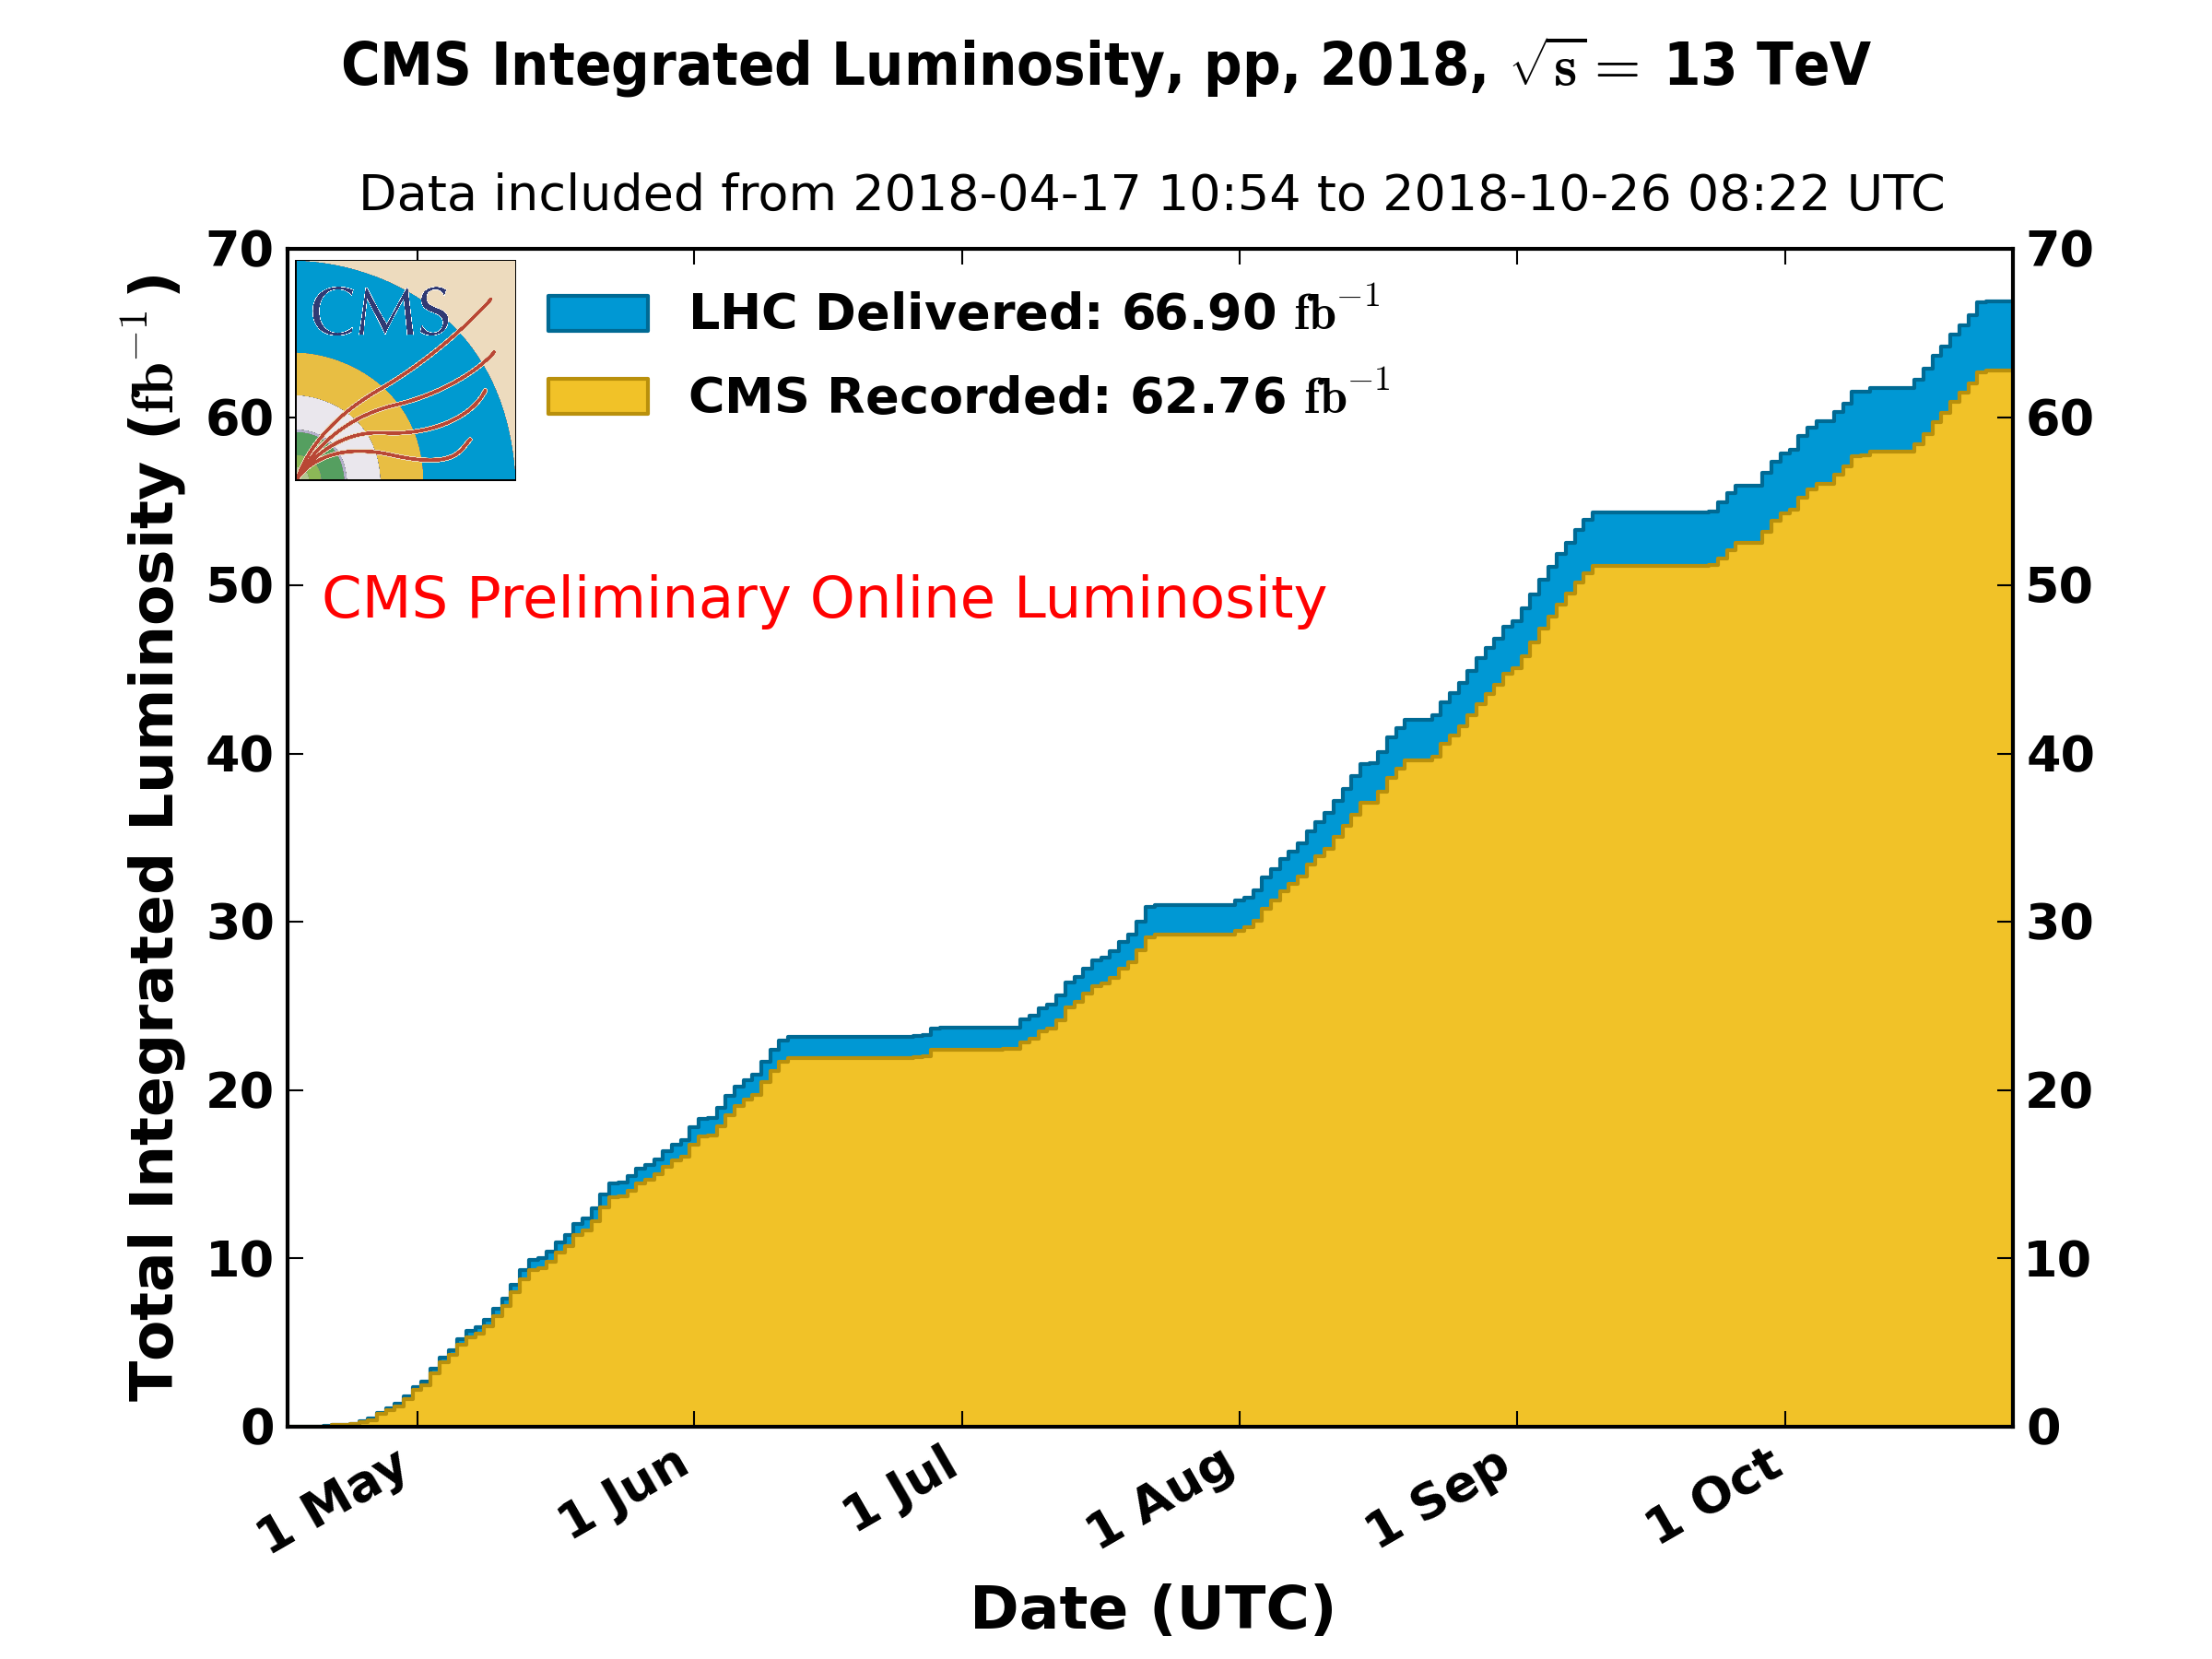 https://cern.ch/cmslumi/publicplots/int_lumi_per_day_cumulative_pp_2018OnlineLumi.png